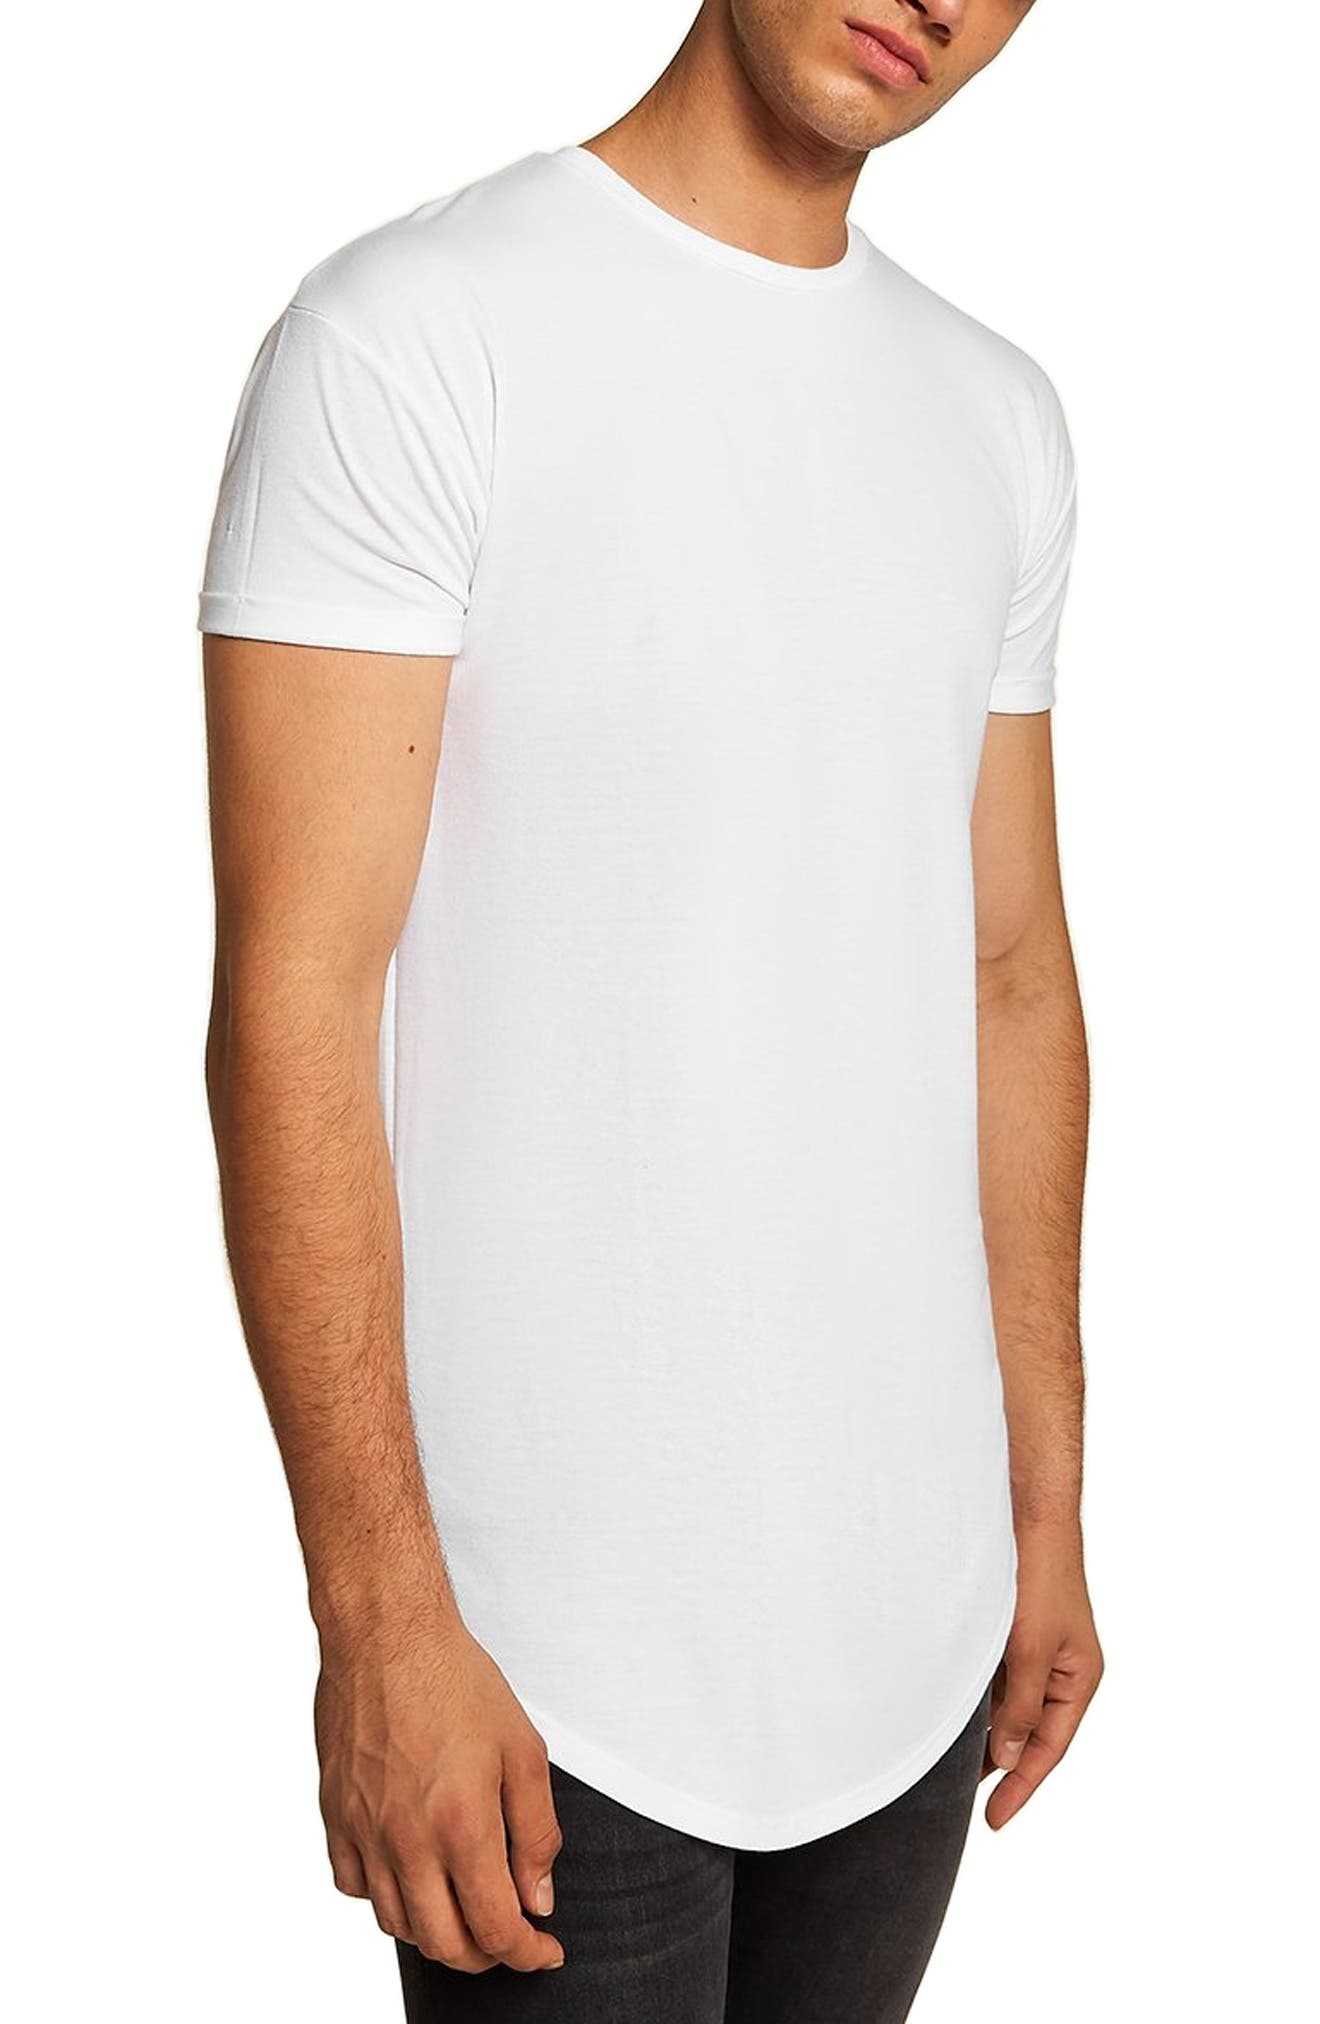 Mens Vintage Shirts – Retro Shirts Mens Topman Scotty Longline Slim Fit T-Shirt Size XX-Large - White $30.00 AT vintagedancer.com